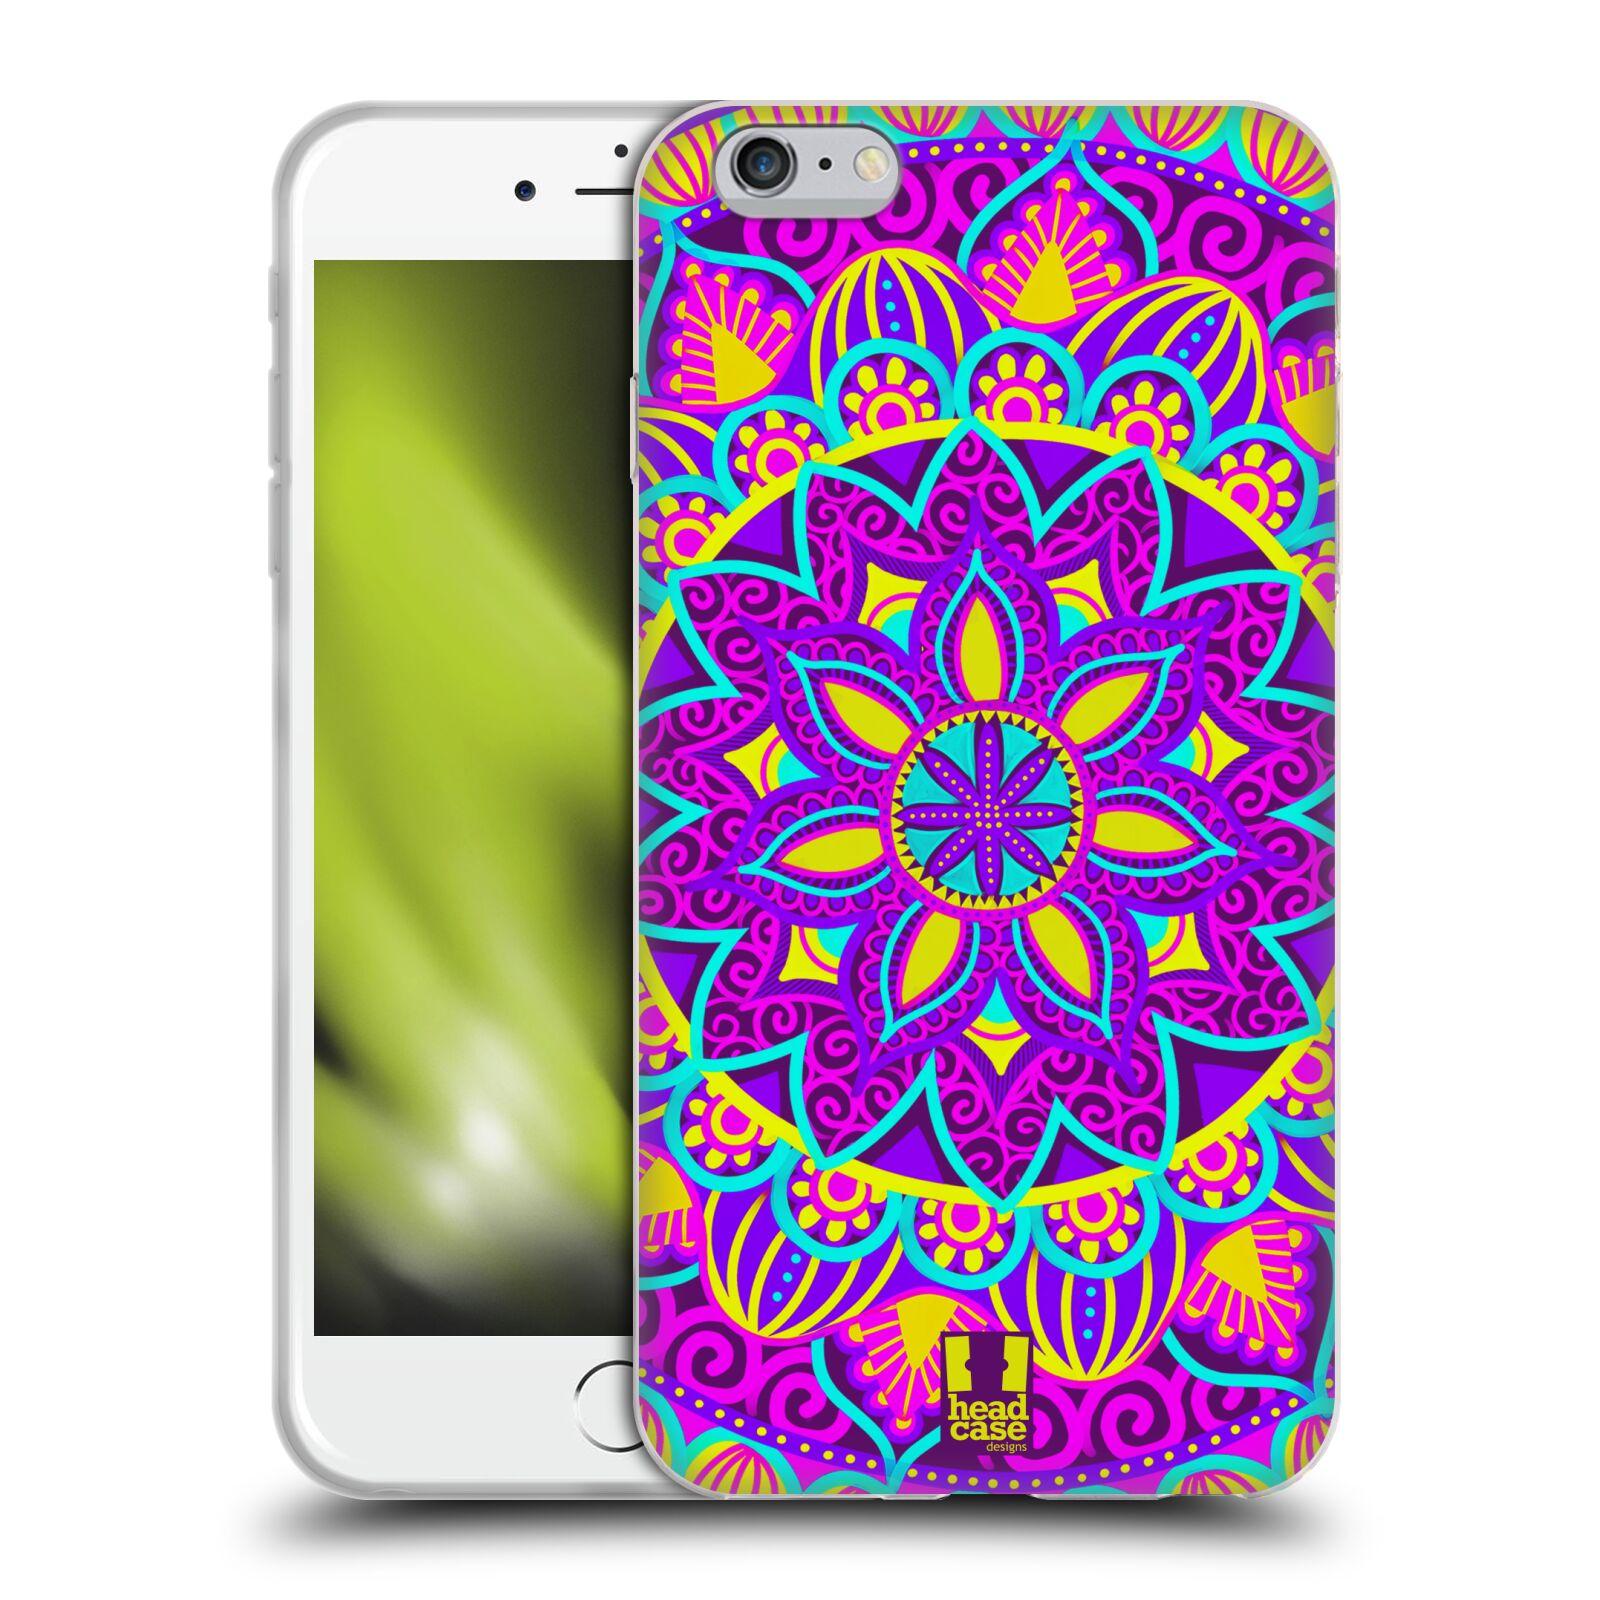 HEAD CASE silikonový obal na mobil Apple Iphone 6 PLUS/ 6S PLUS vzor Indie Mandala květinový motiv FIALOVÁ KVĚTINA